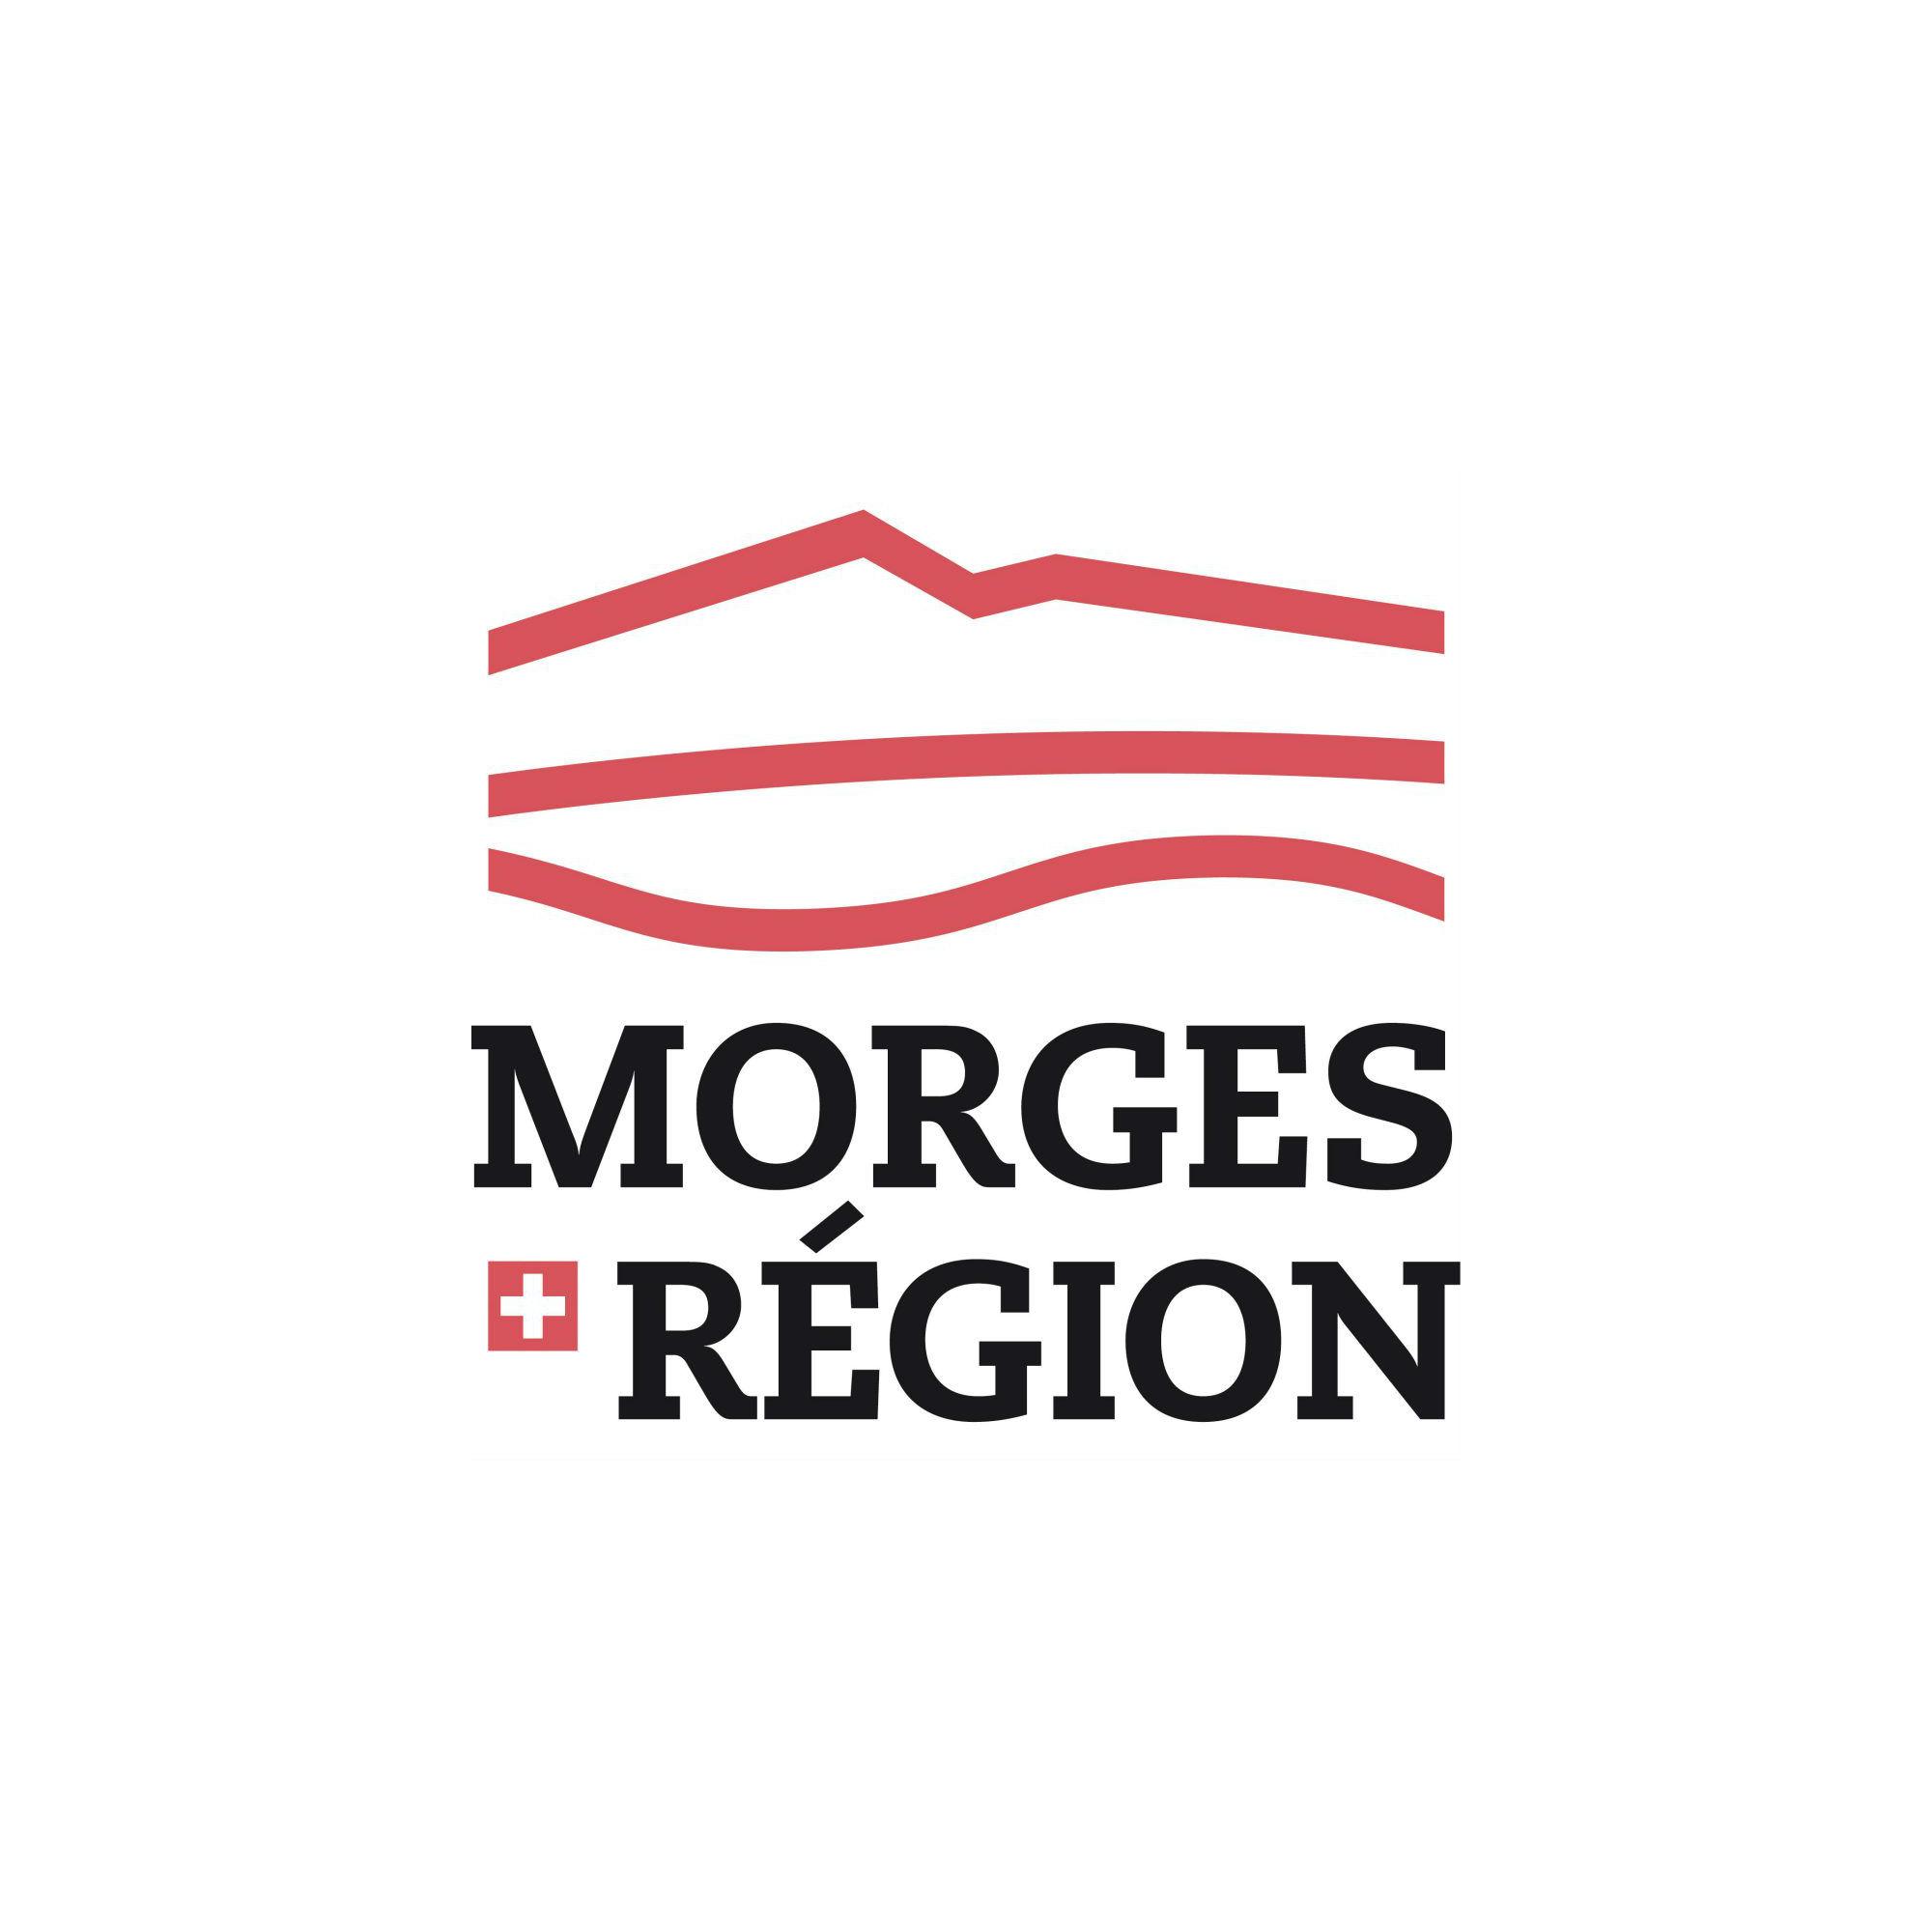 Morges-Region_Div-1024x1024